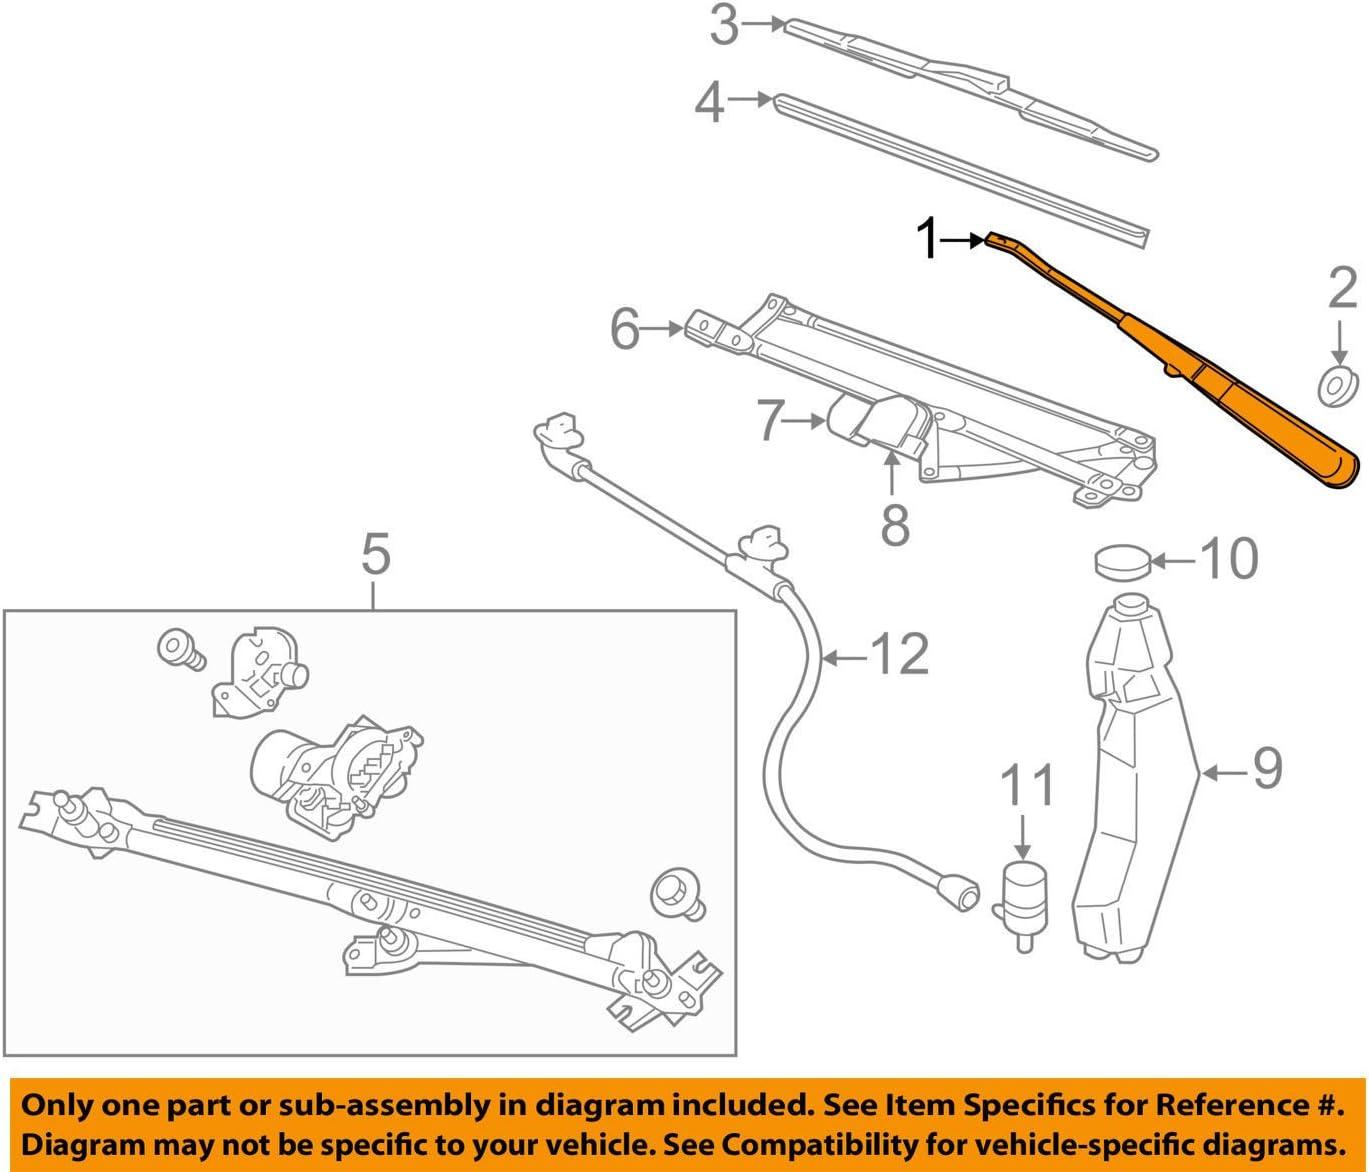 Genuine Hyundai 64501-33310 Fender Apron Panel Assembly